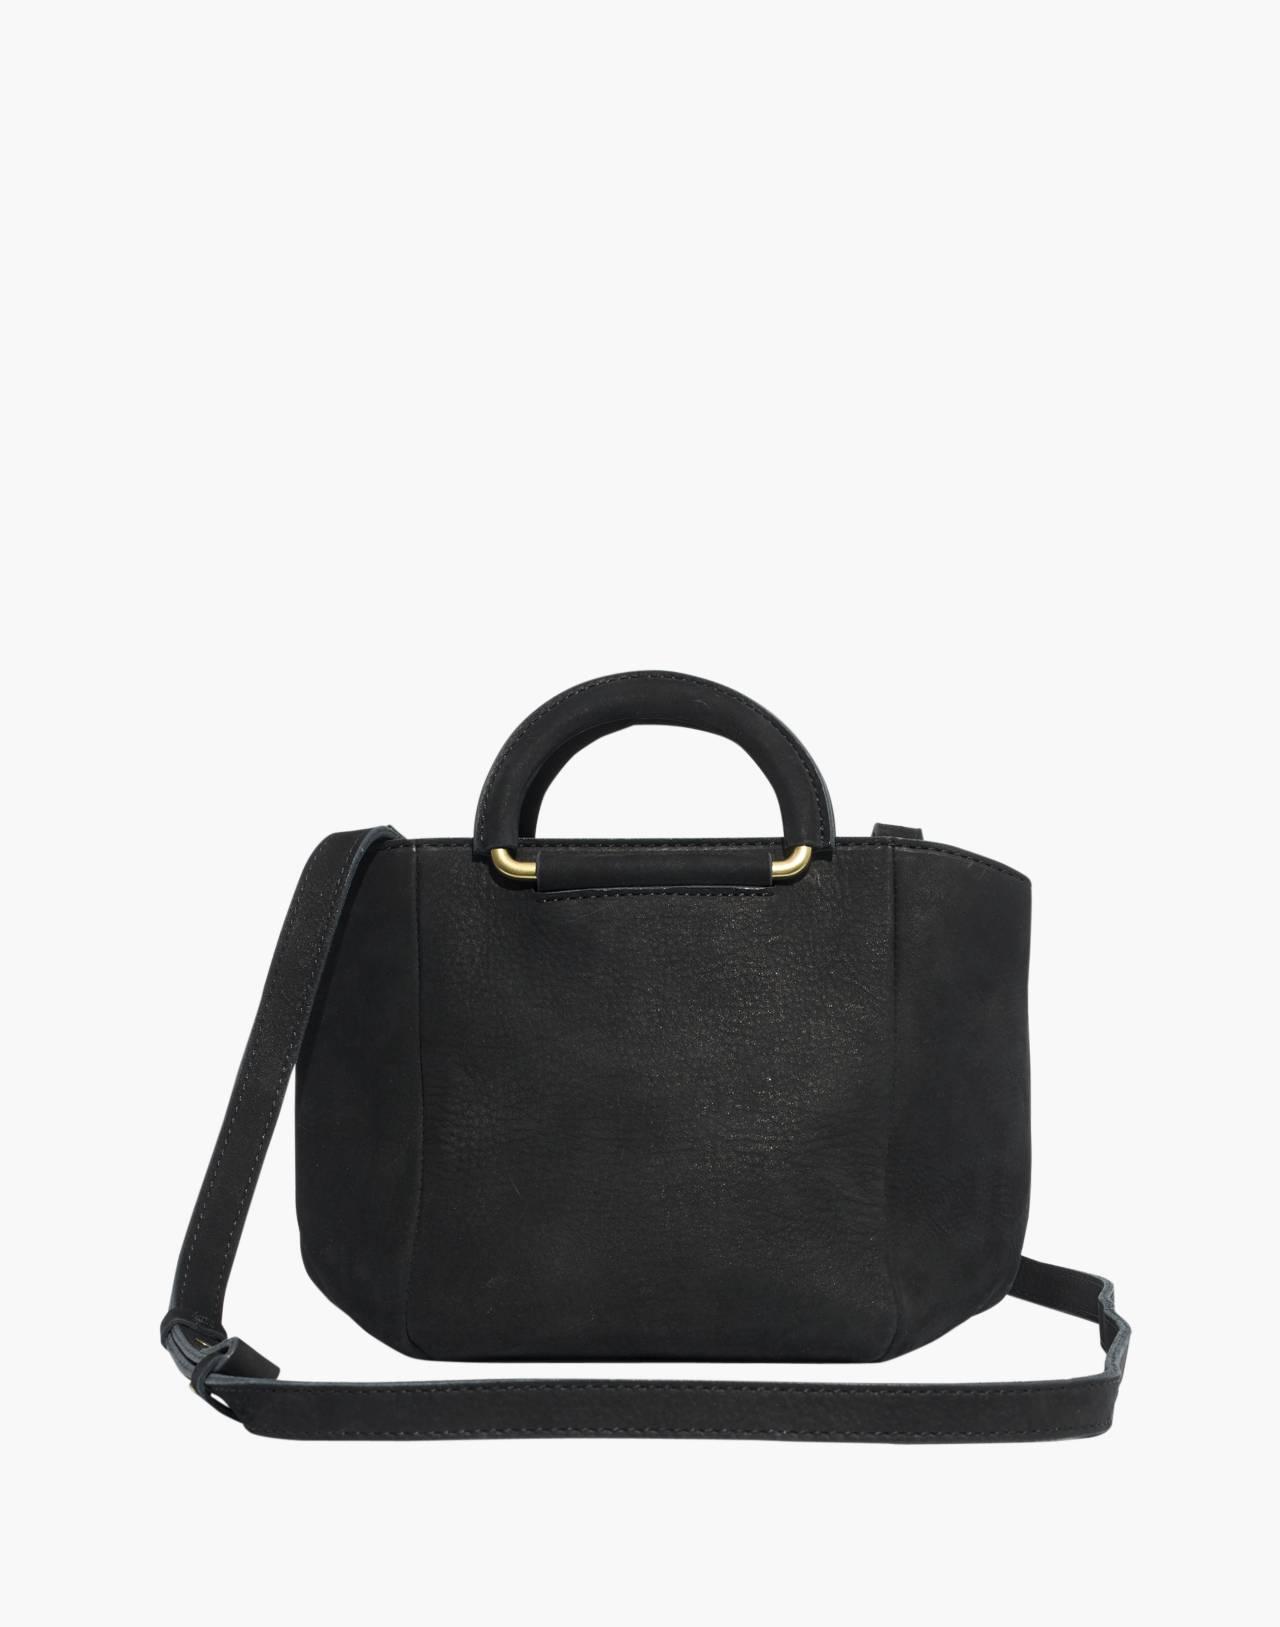 The Top-Handle Mini Bag in true black image 1